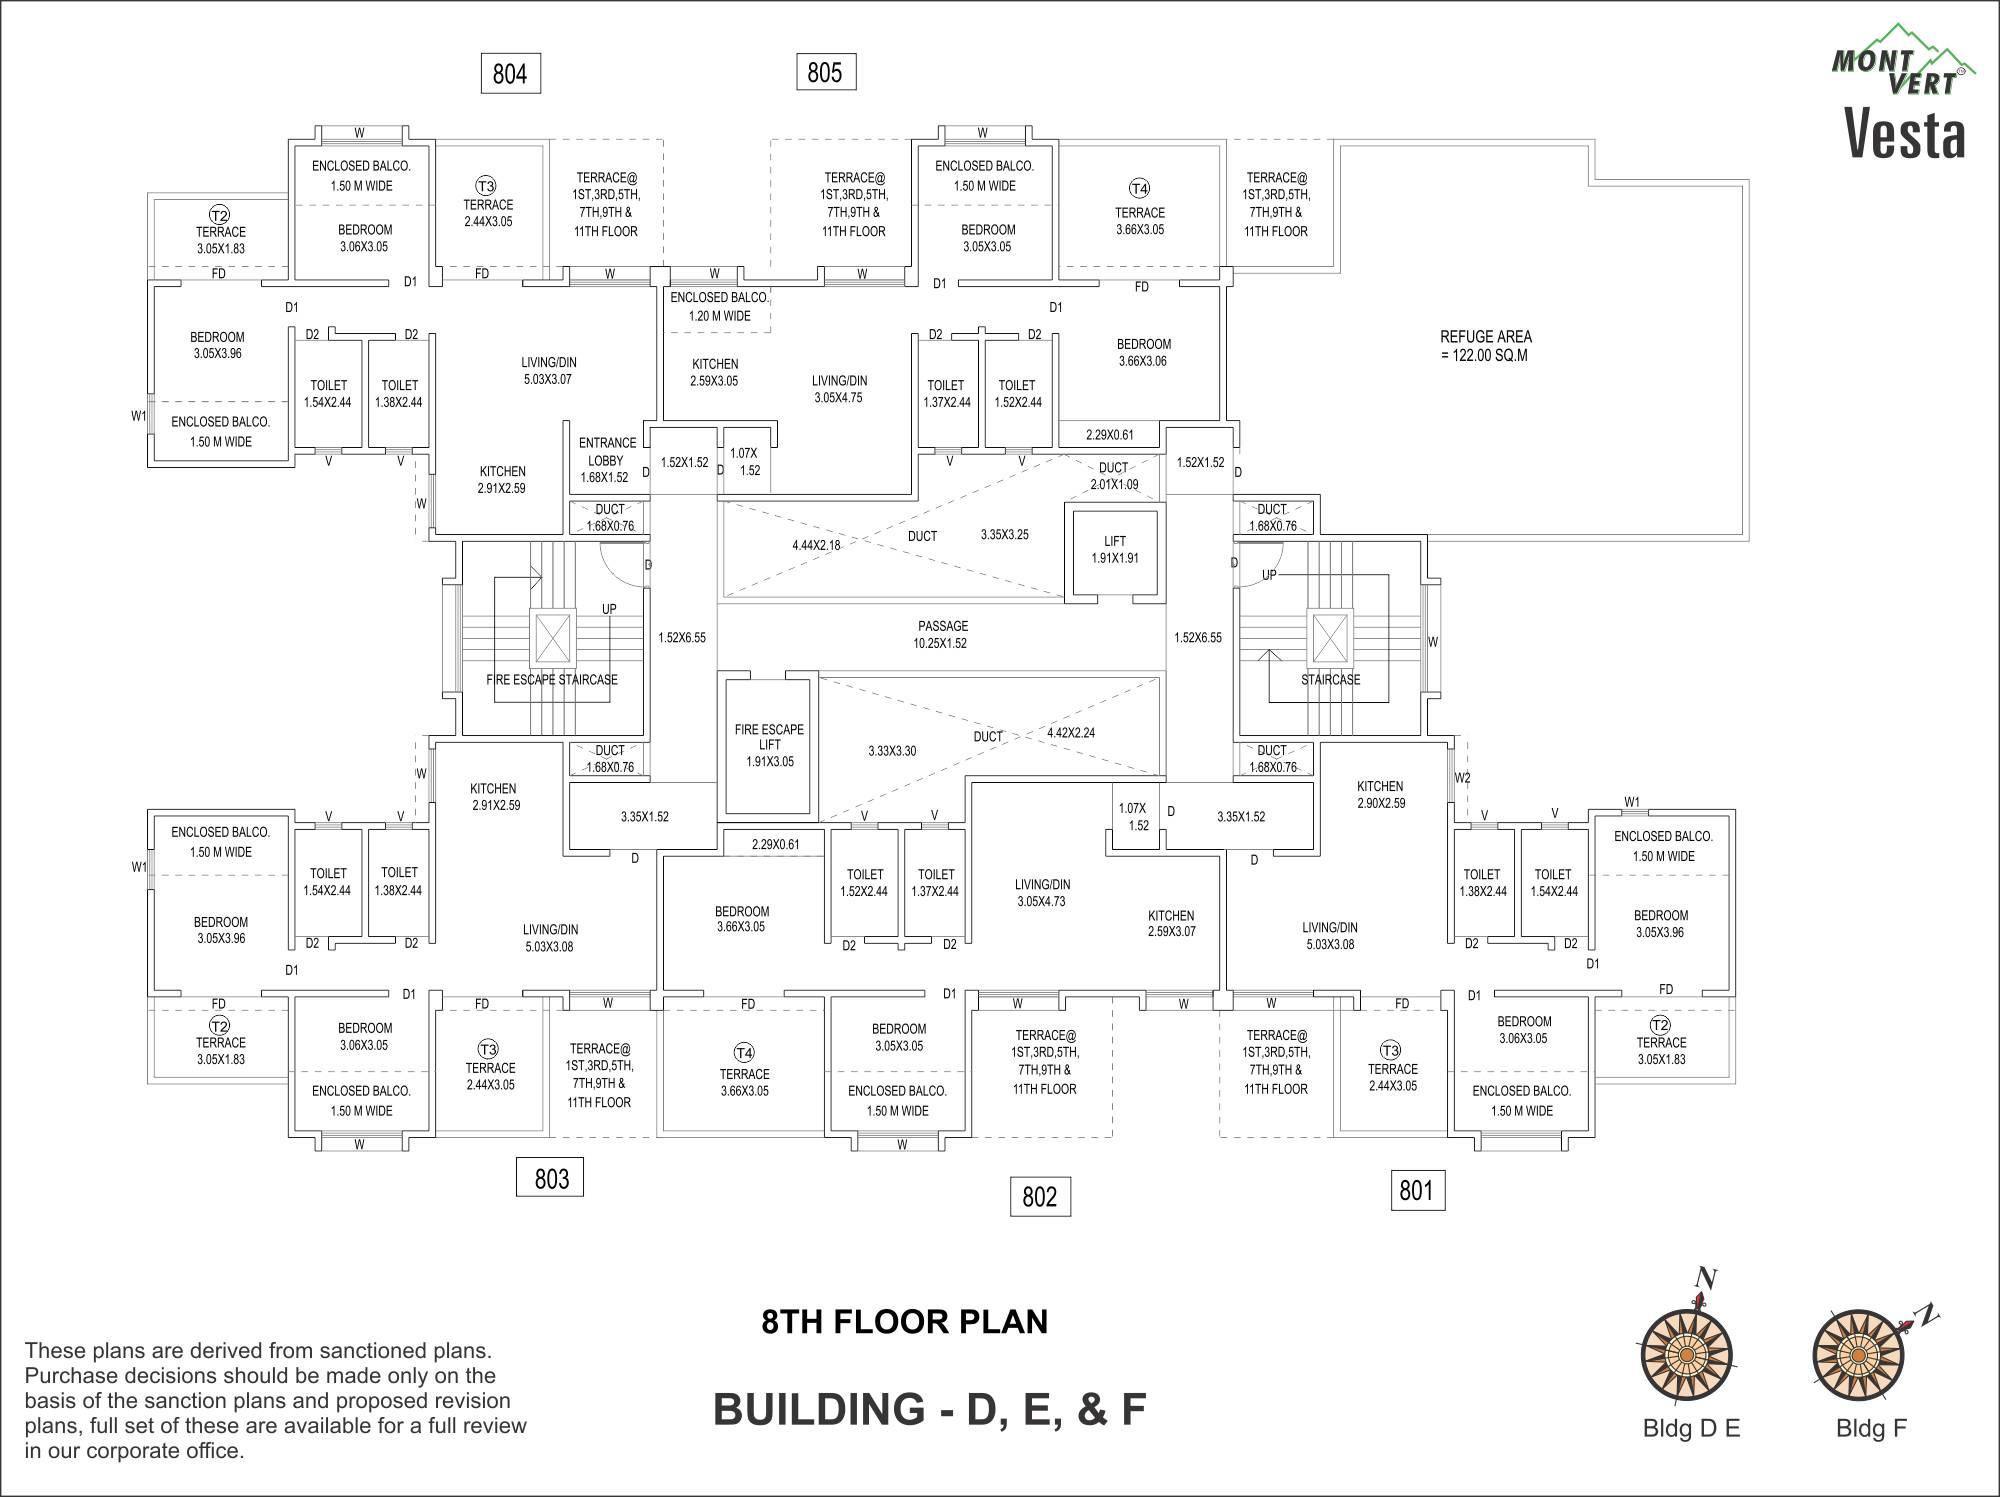 2 BHK 8th Floor Plans – Mont Vert Vesta